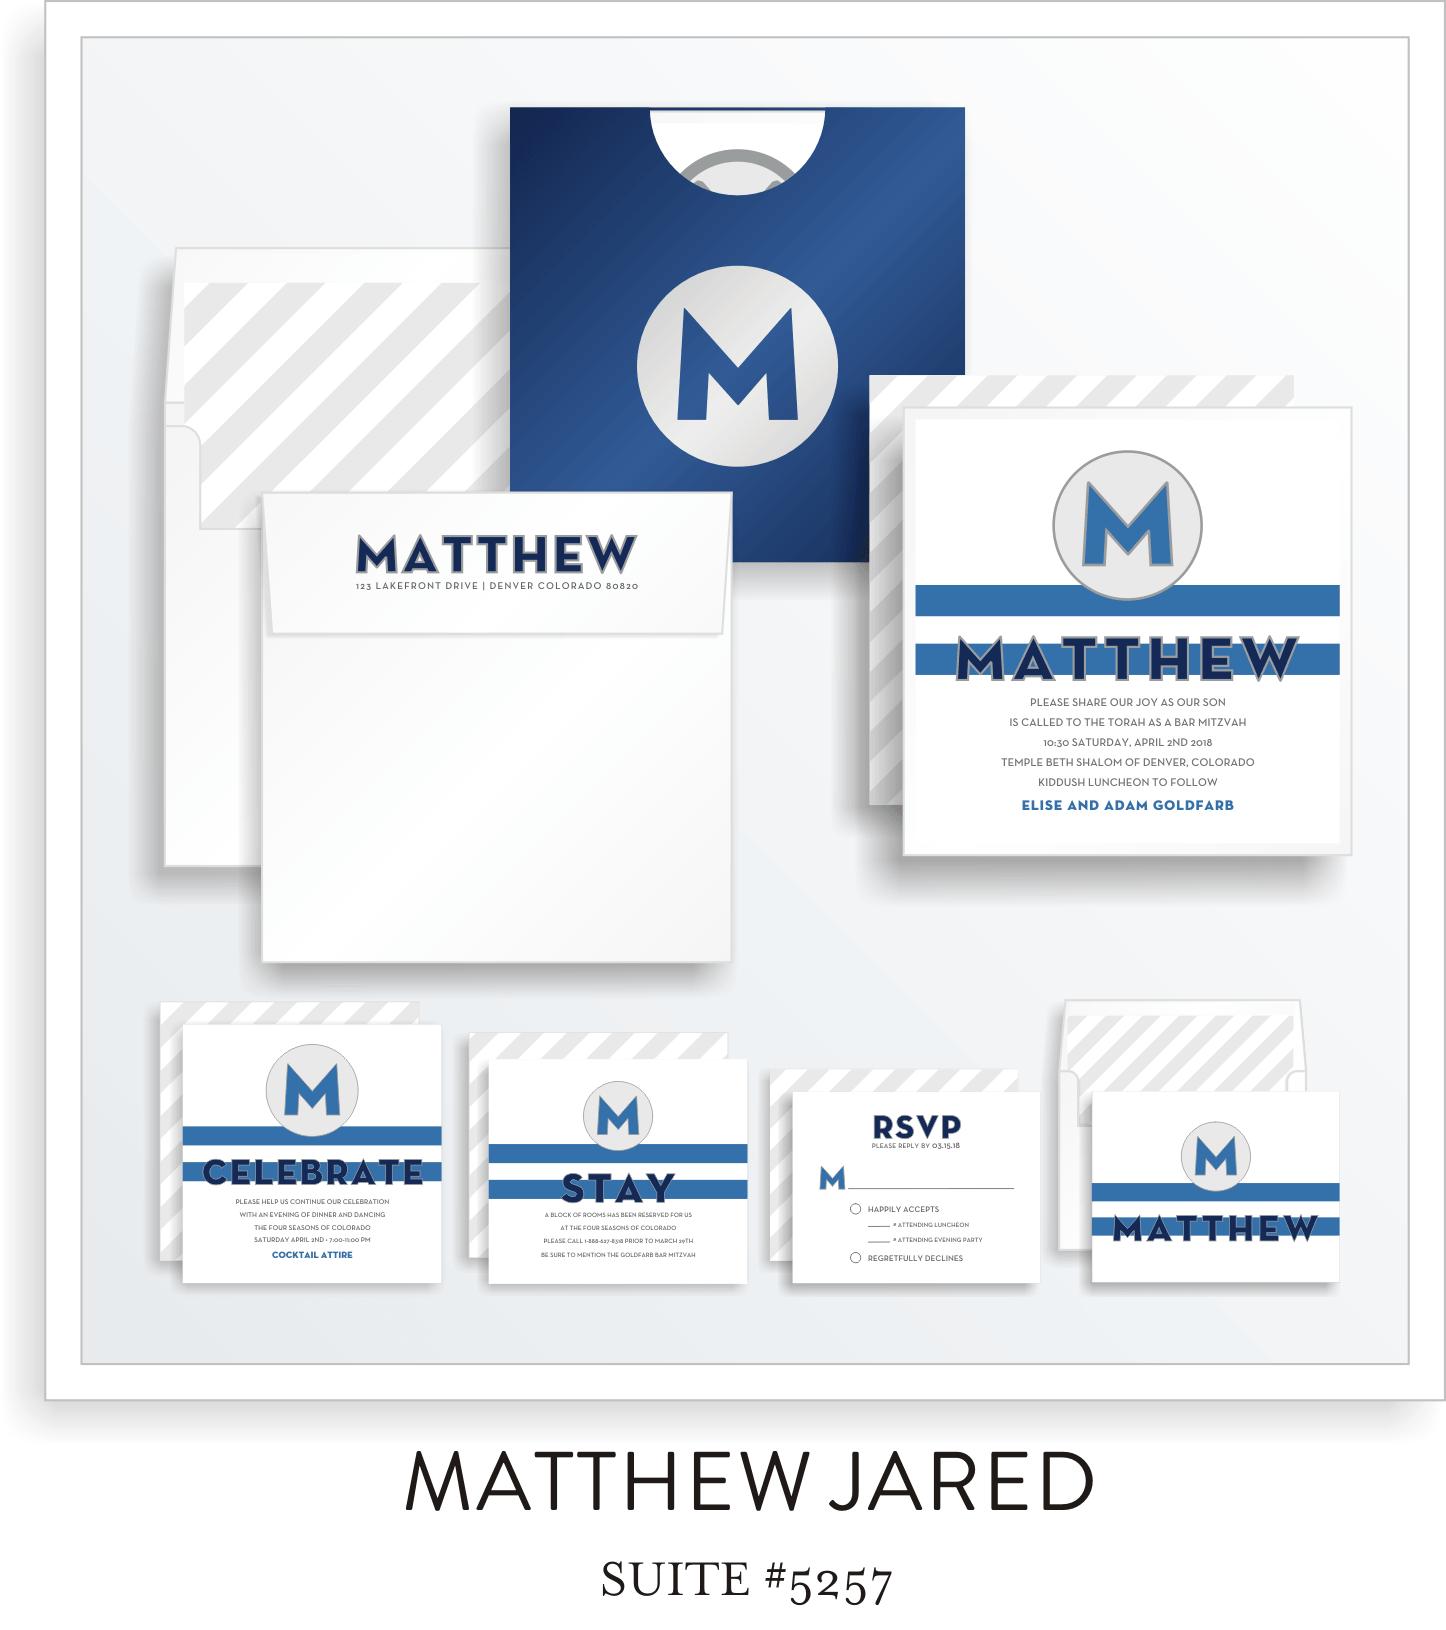 Copy of Copy of Bar Mitzvah Invitation Suite 5257 - Matthew Jared